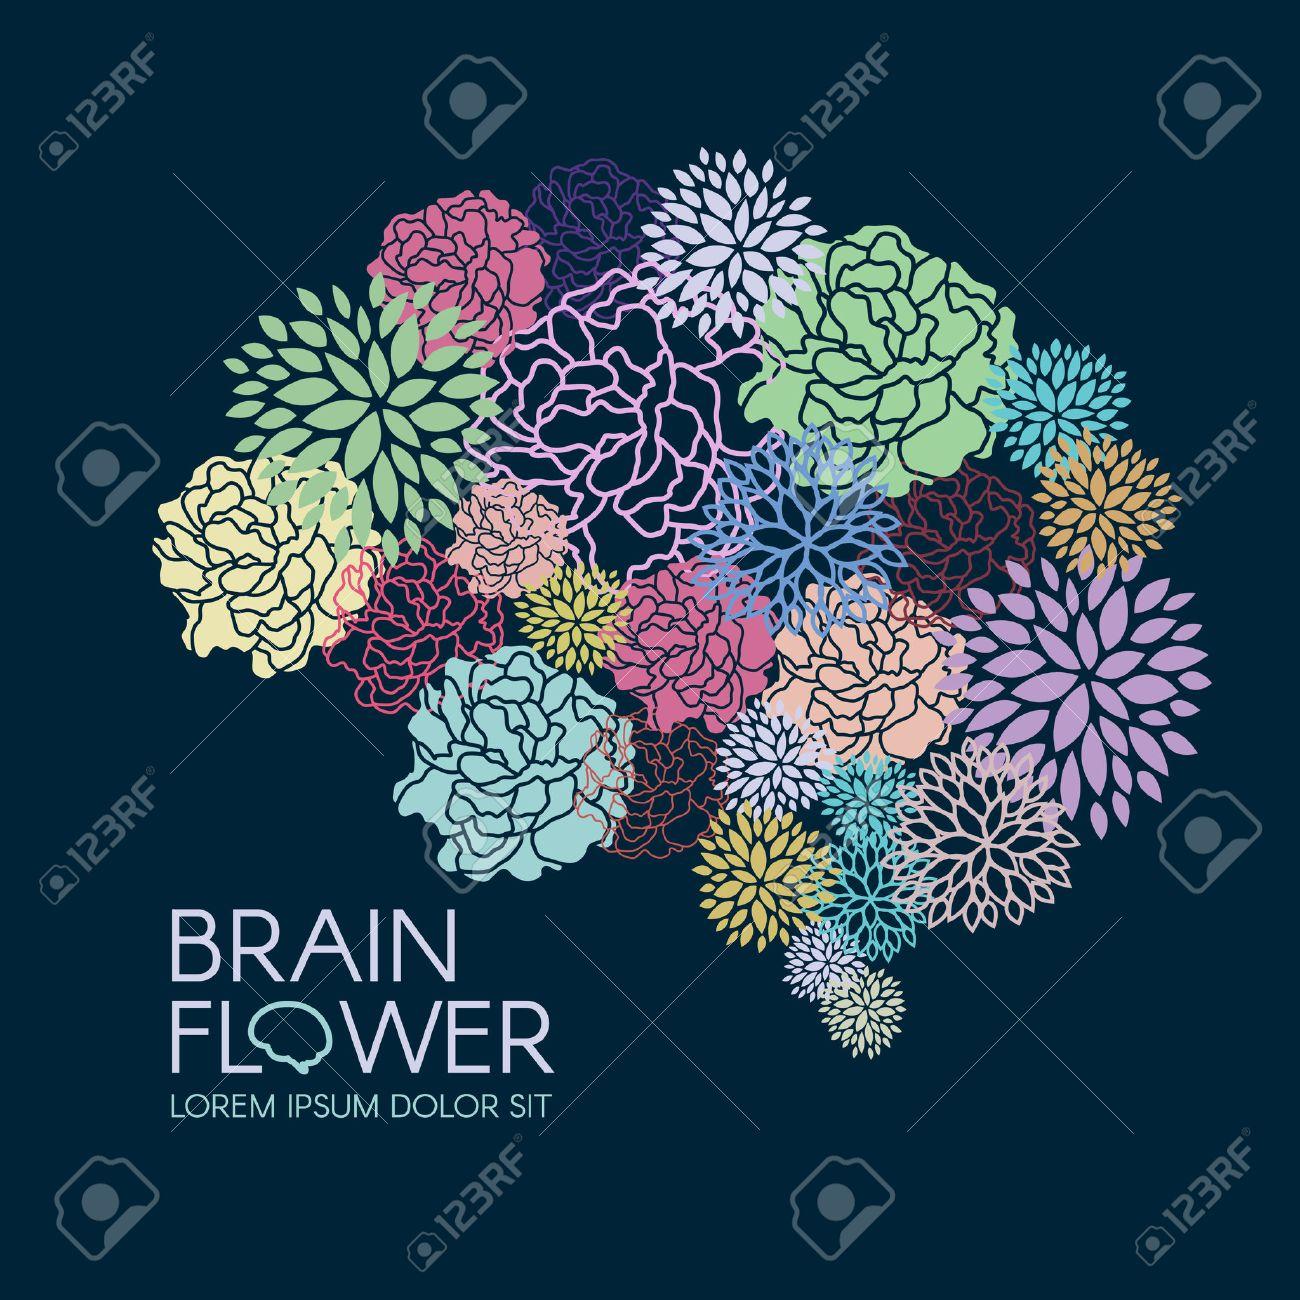 Beautiful Flora Brain flower abstract vector illustration - 52223637